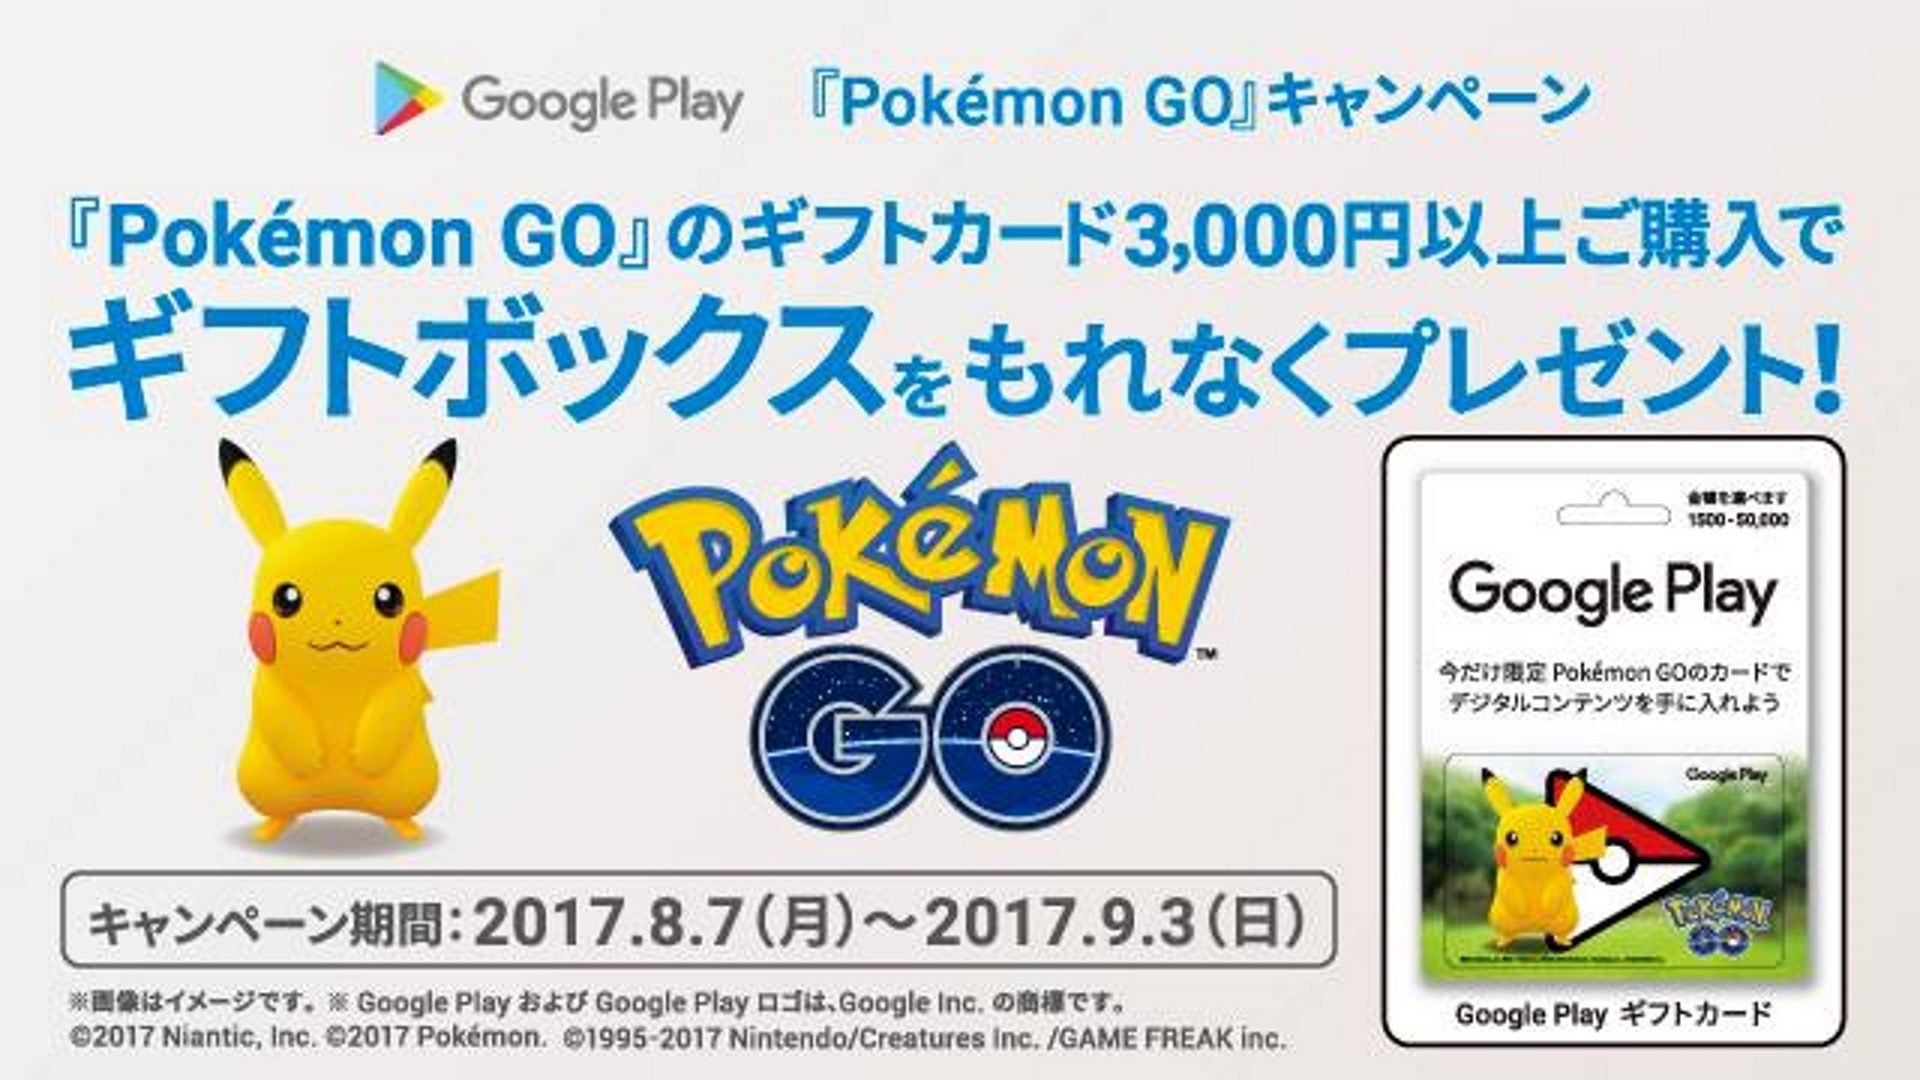 「Pokémon GO」Google Playギフトカード3,000円以上購入でギフトボックスプレゼント